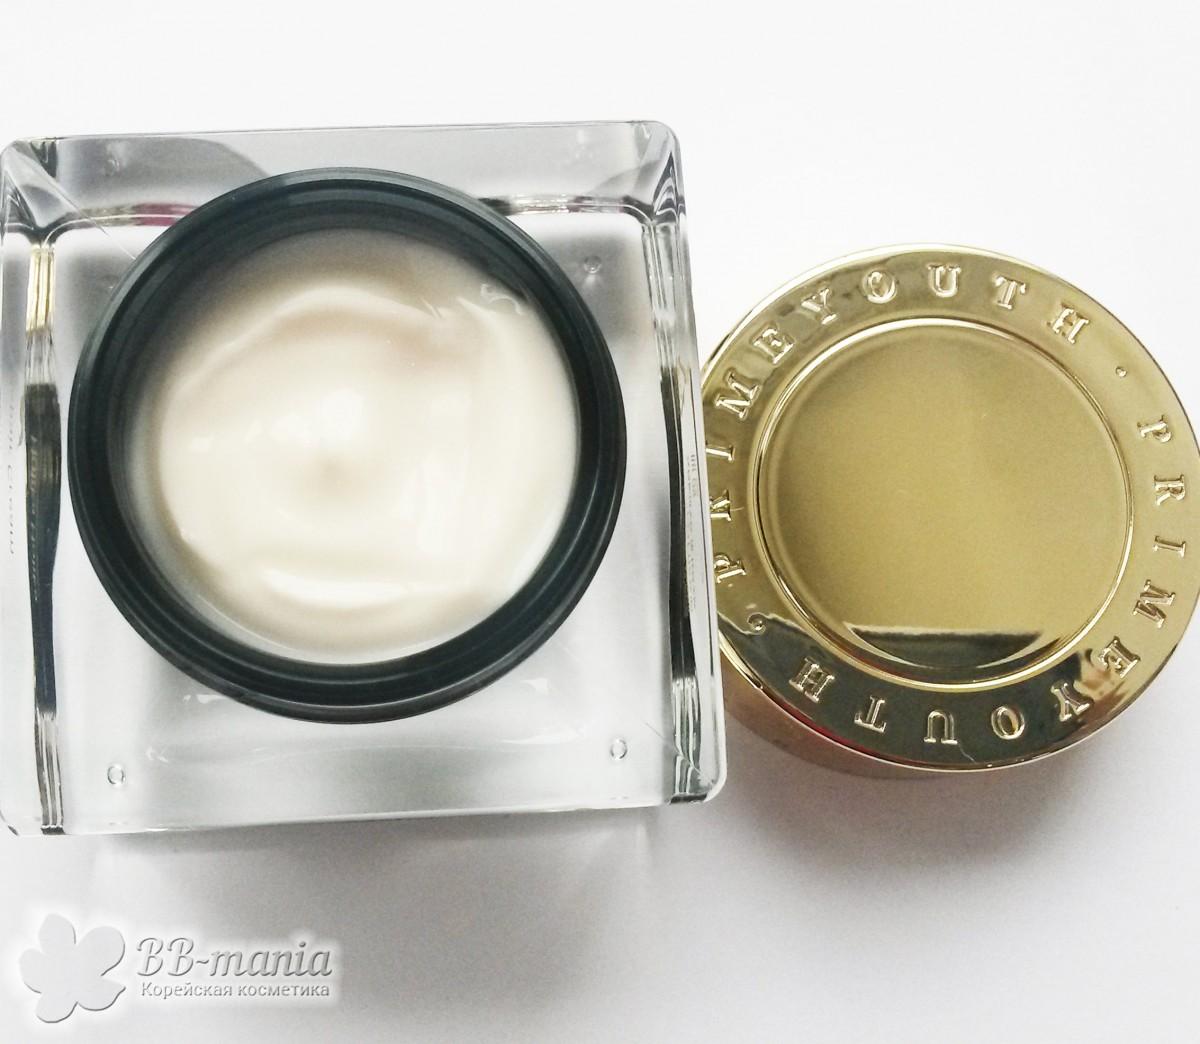 Prime Youth Black Snail Repair Cream [Holika Holika]